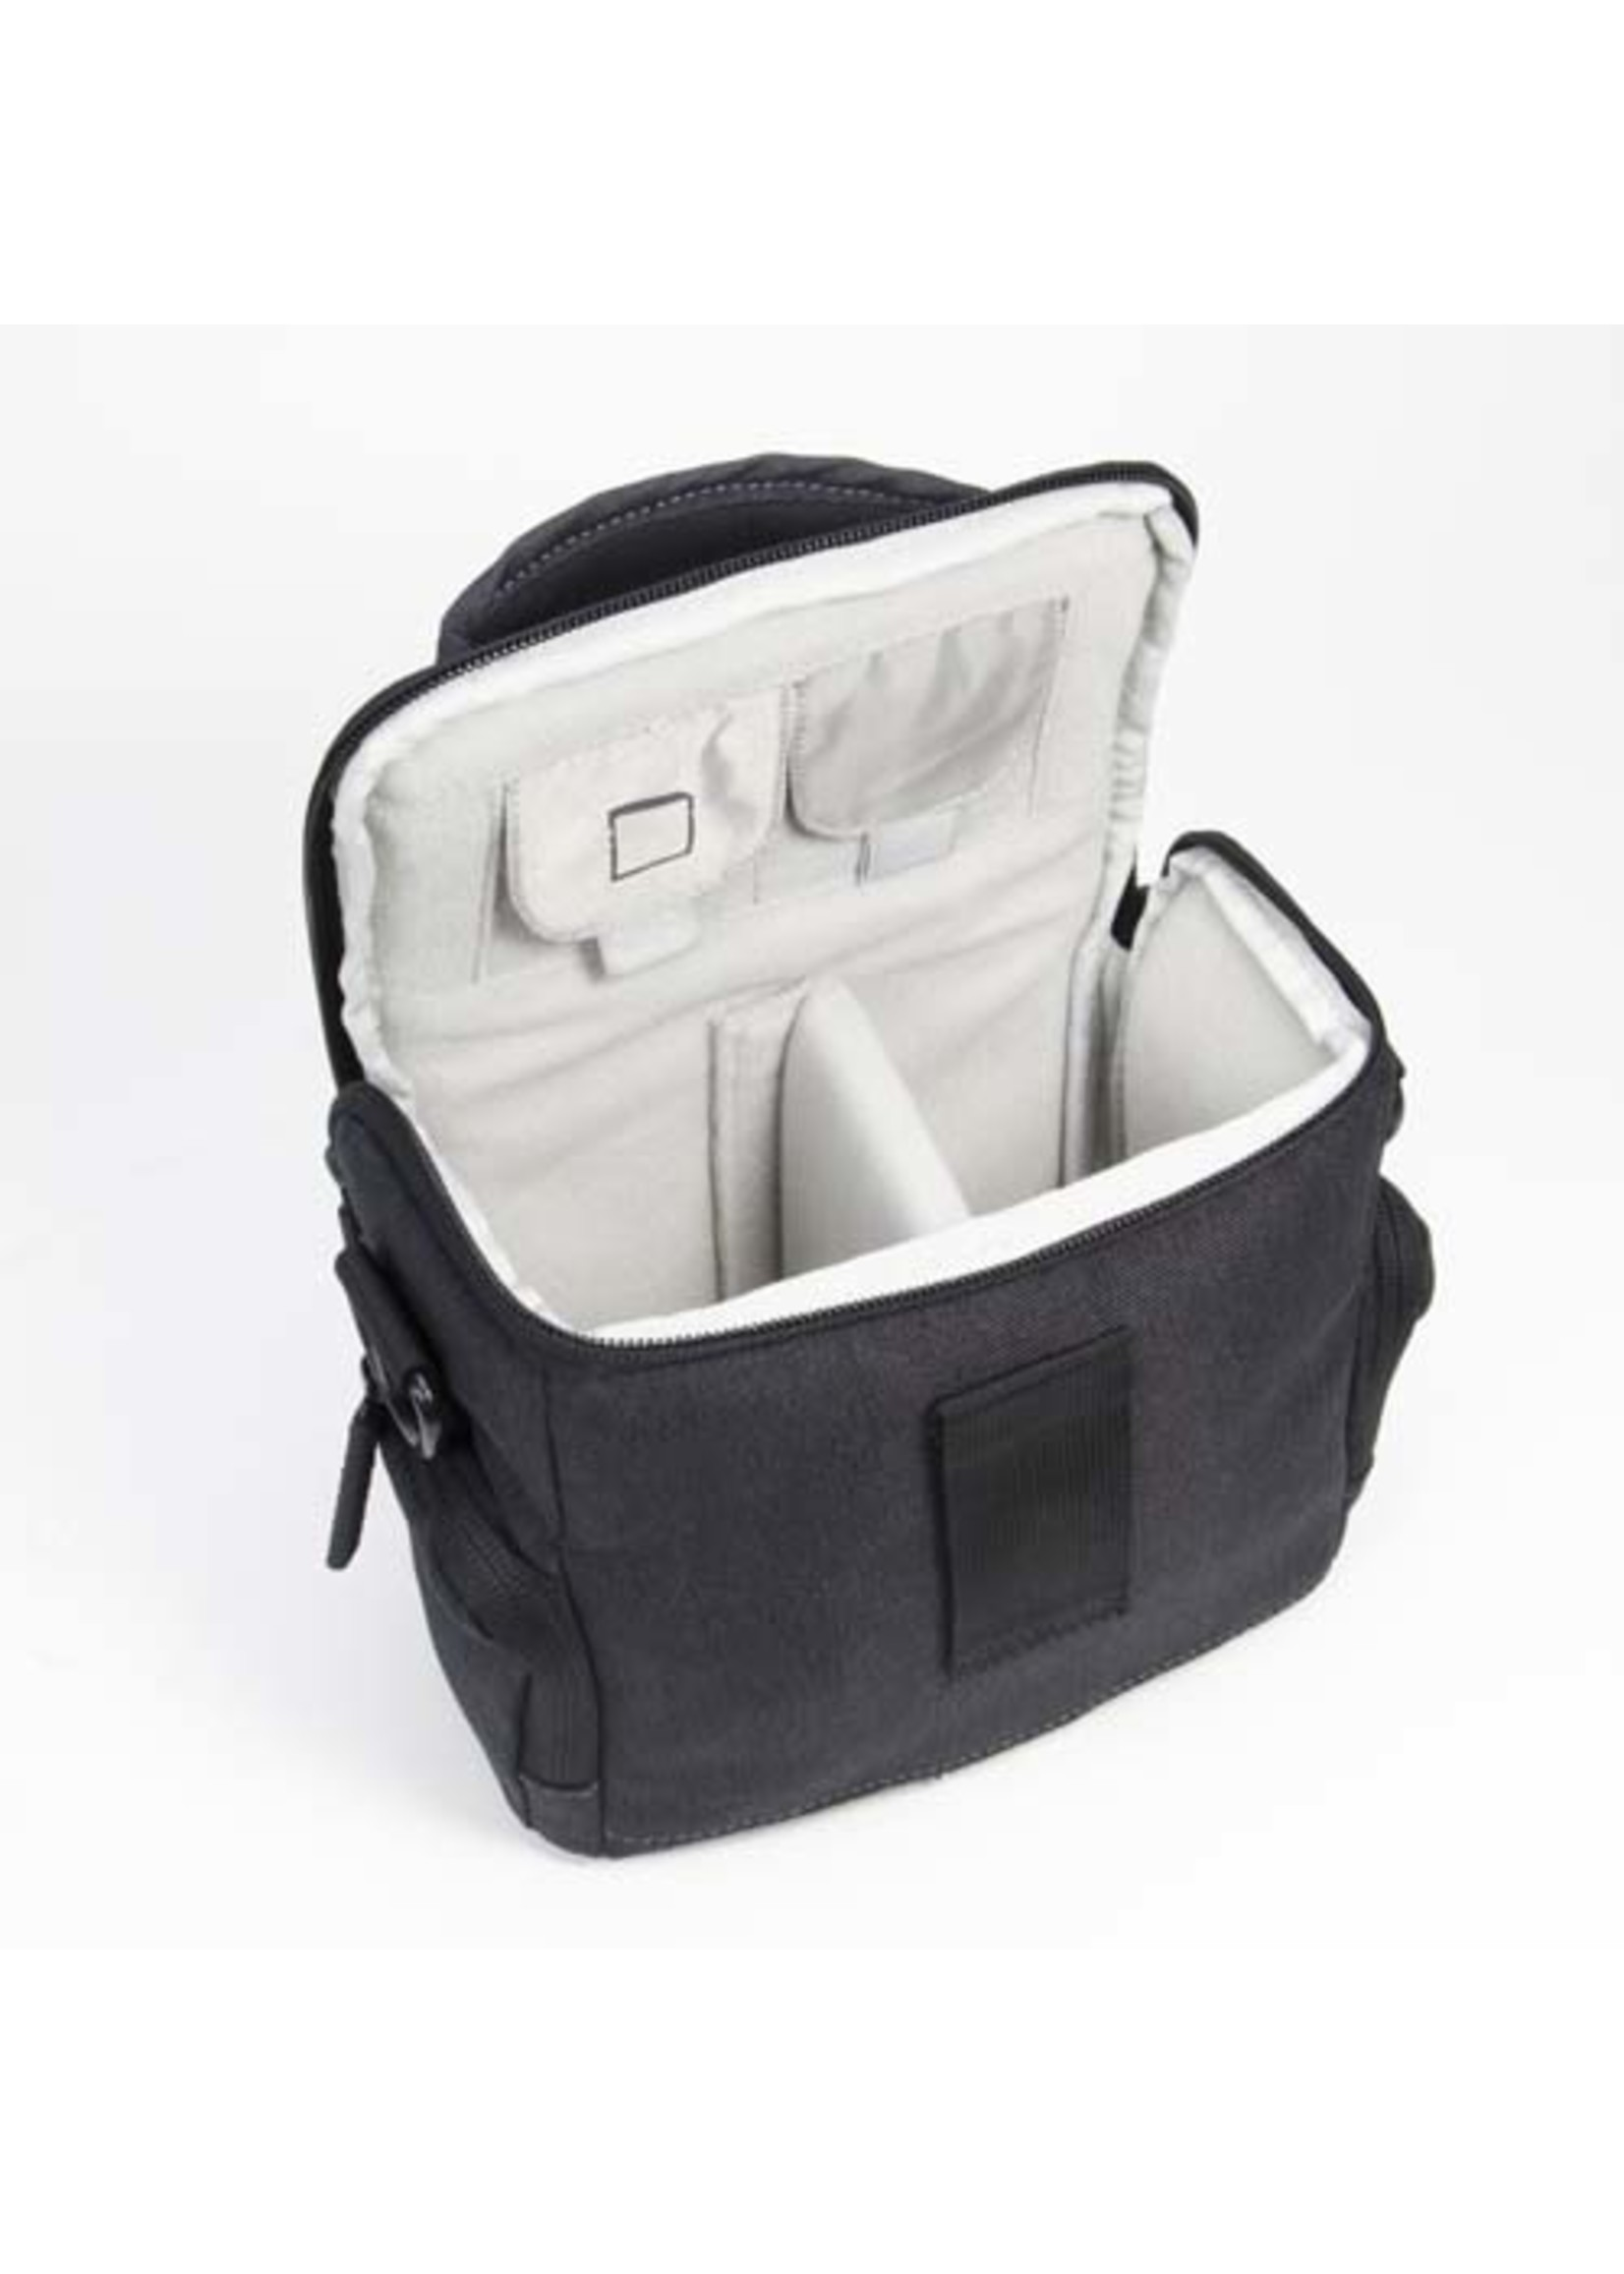 ProMaster ProMaster City 10 Camera Bag Grey - 2021